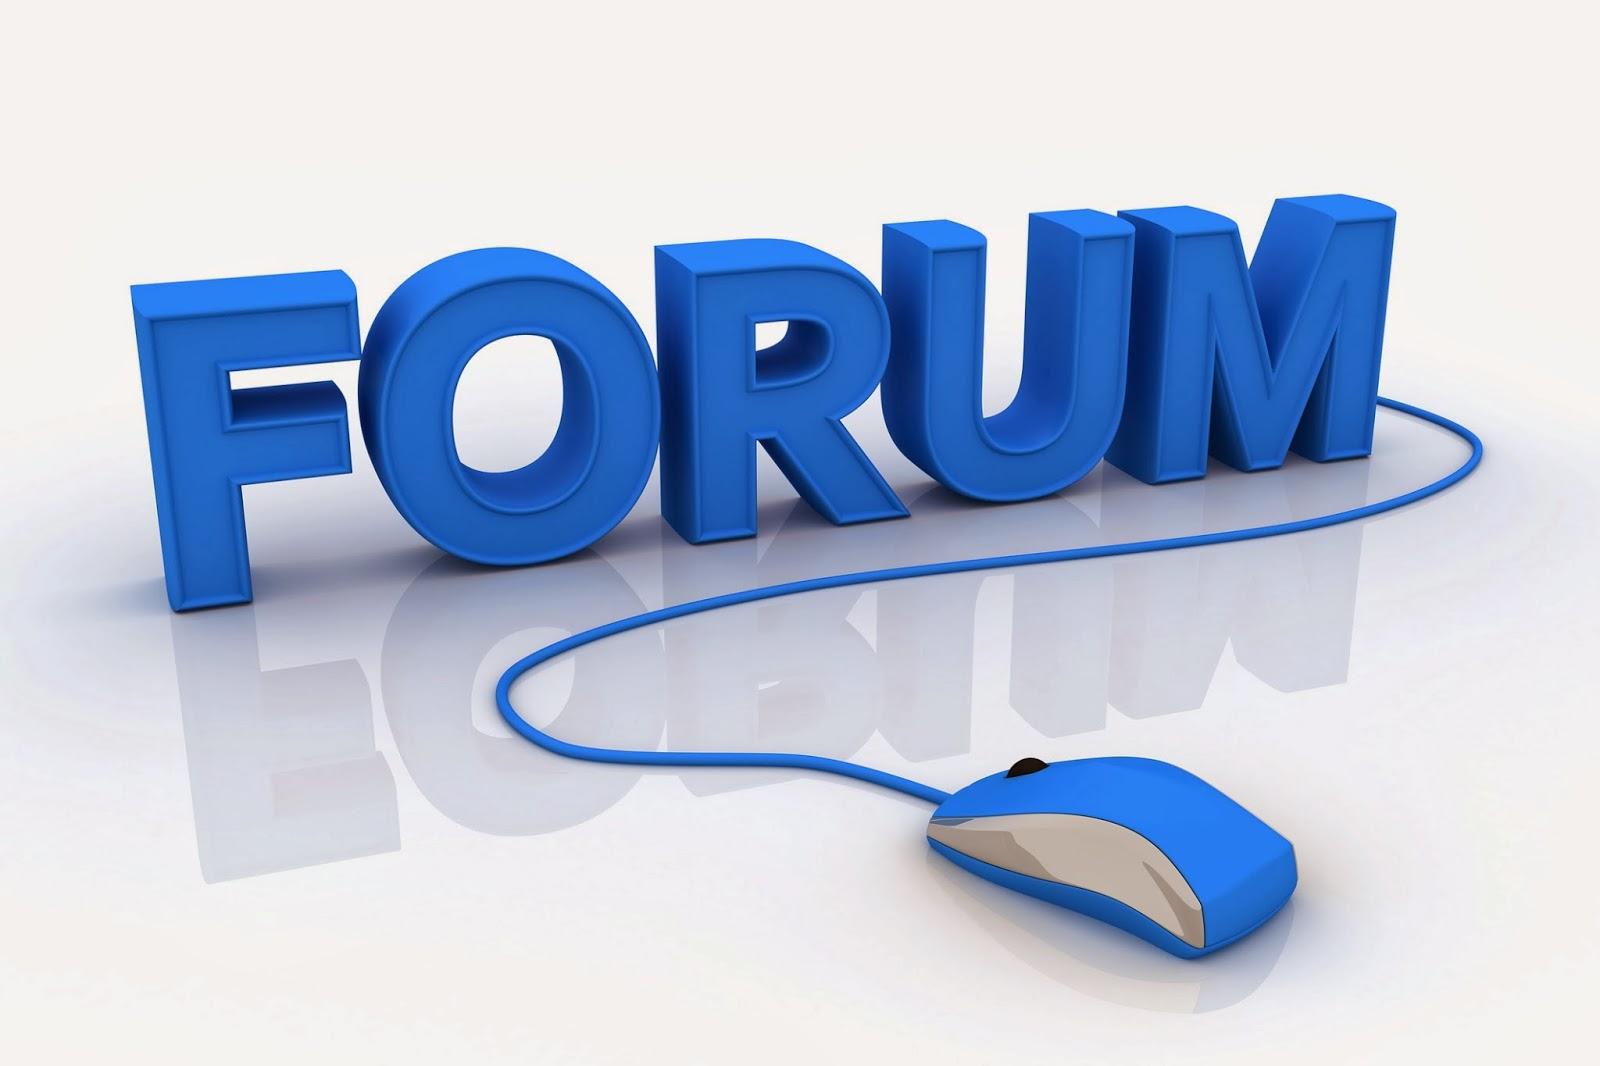 5000 High Quality Forum backlinks Posts & profiles